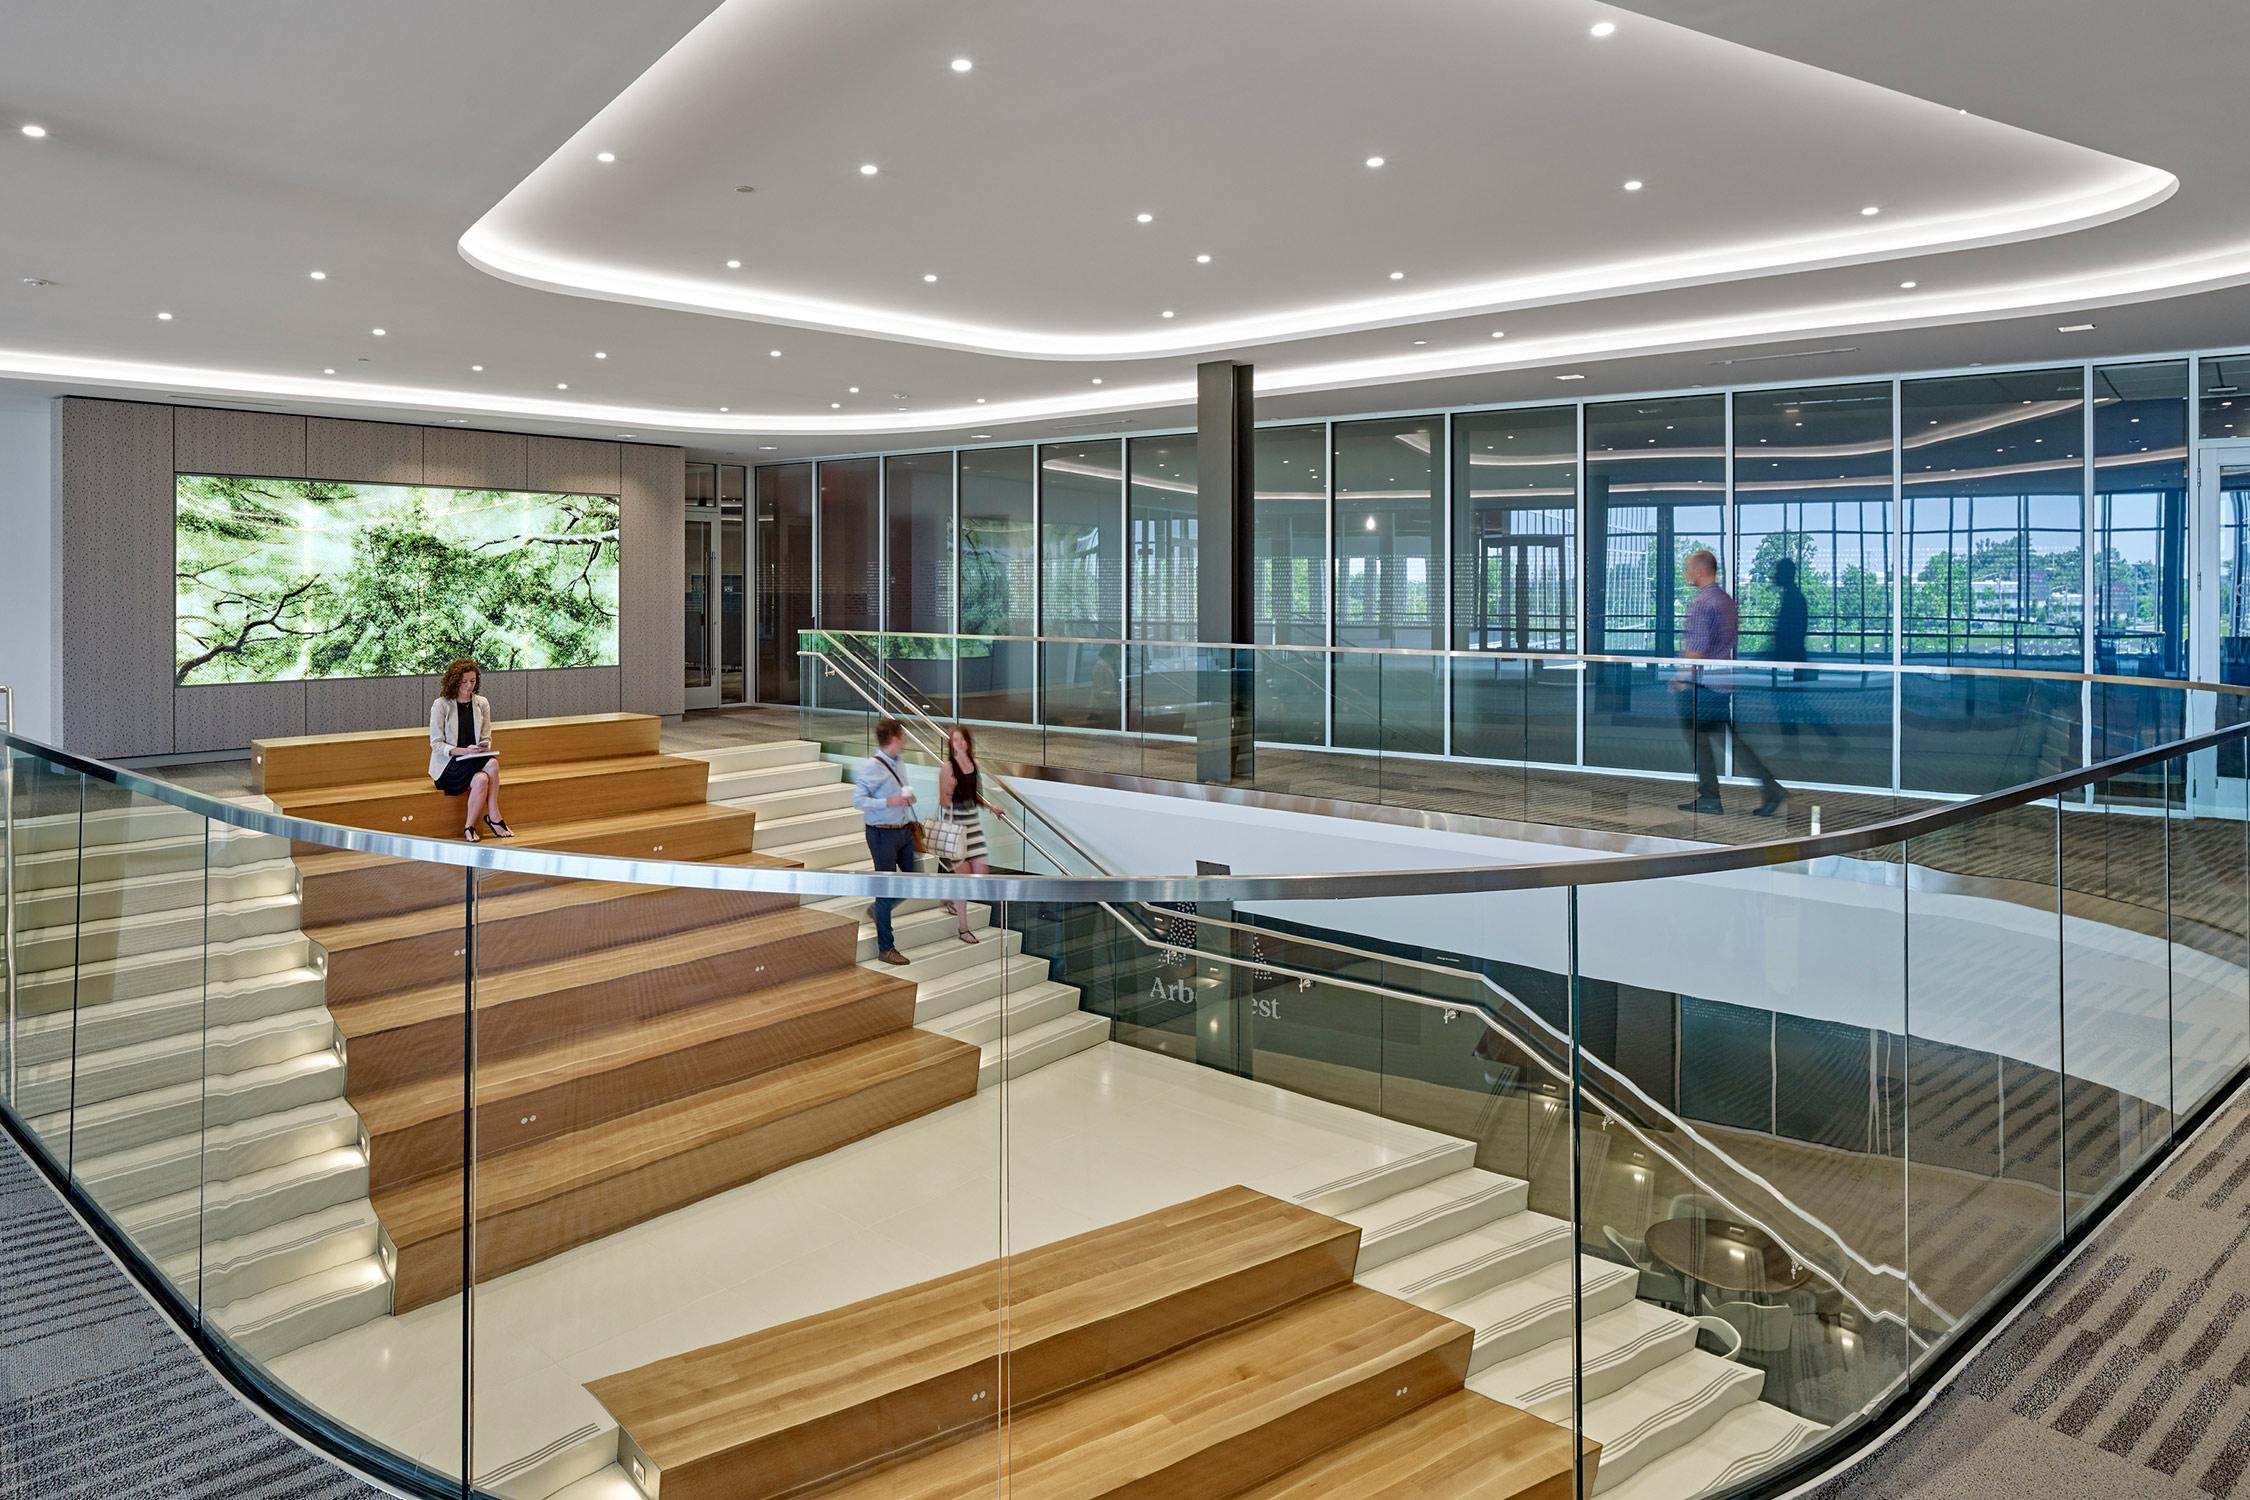 New Interior Amenities